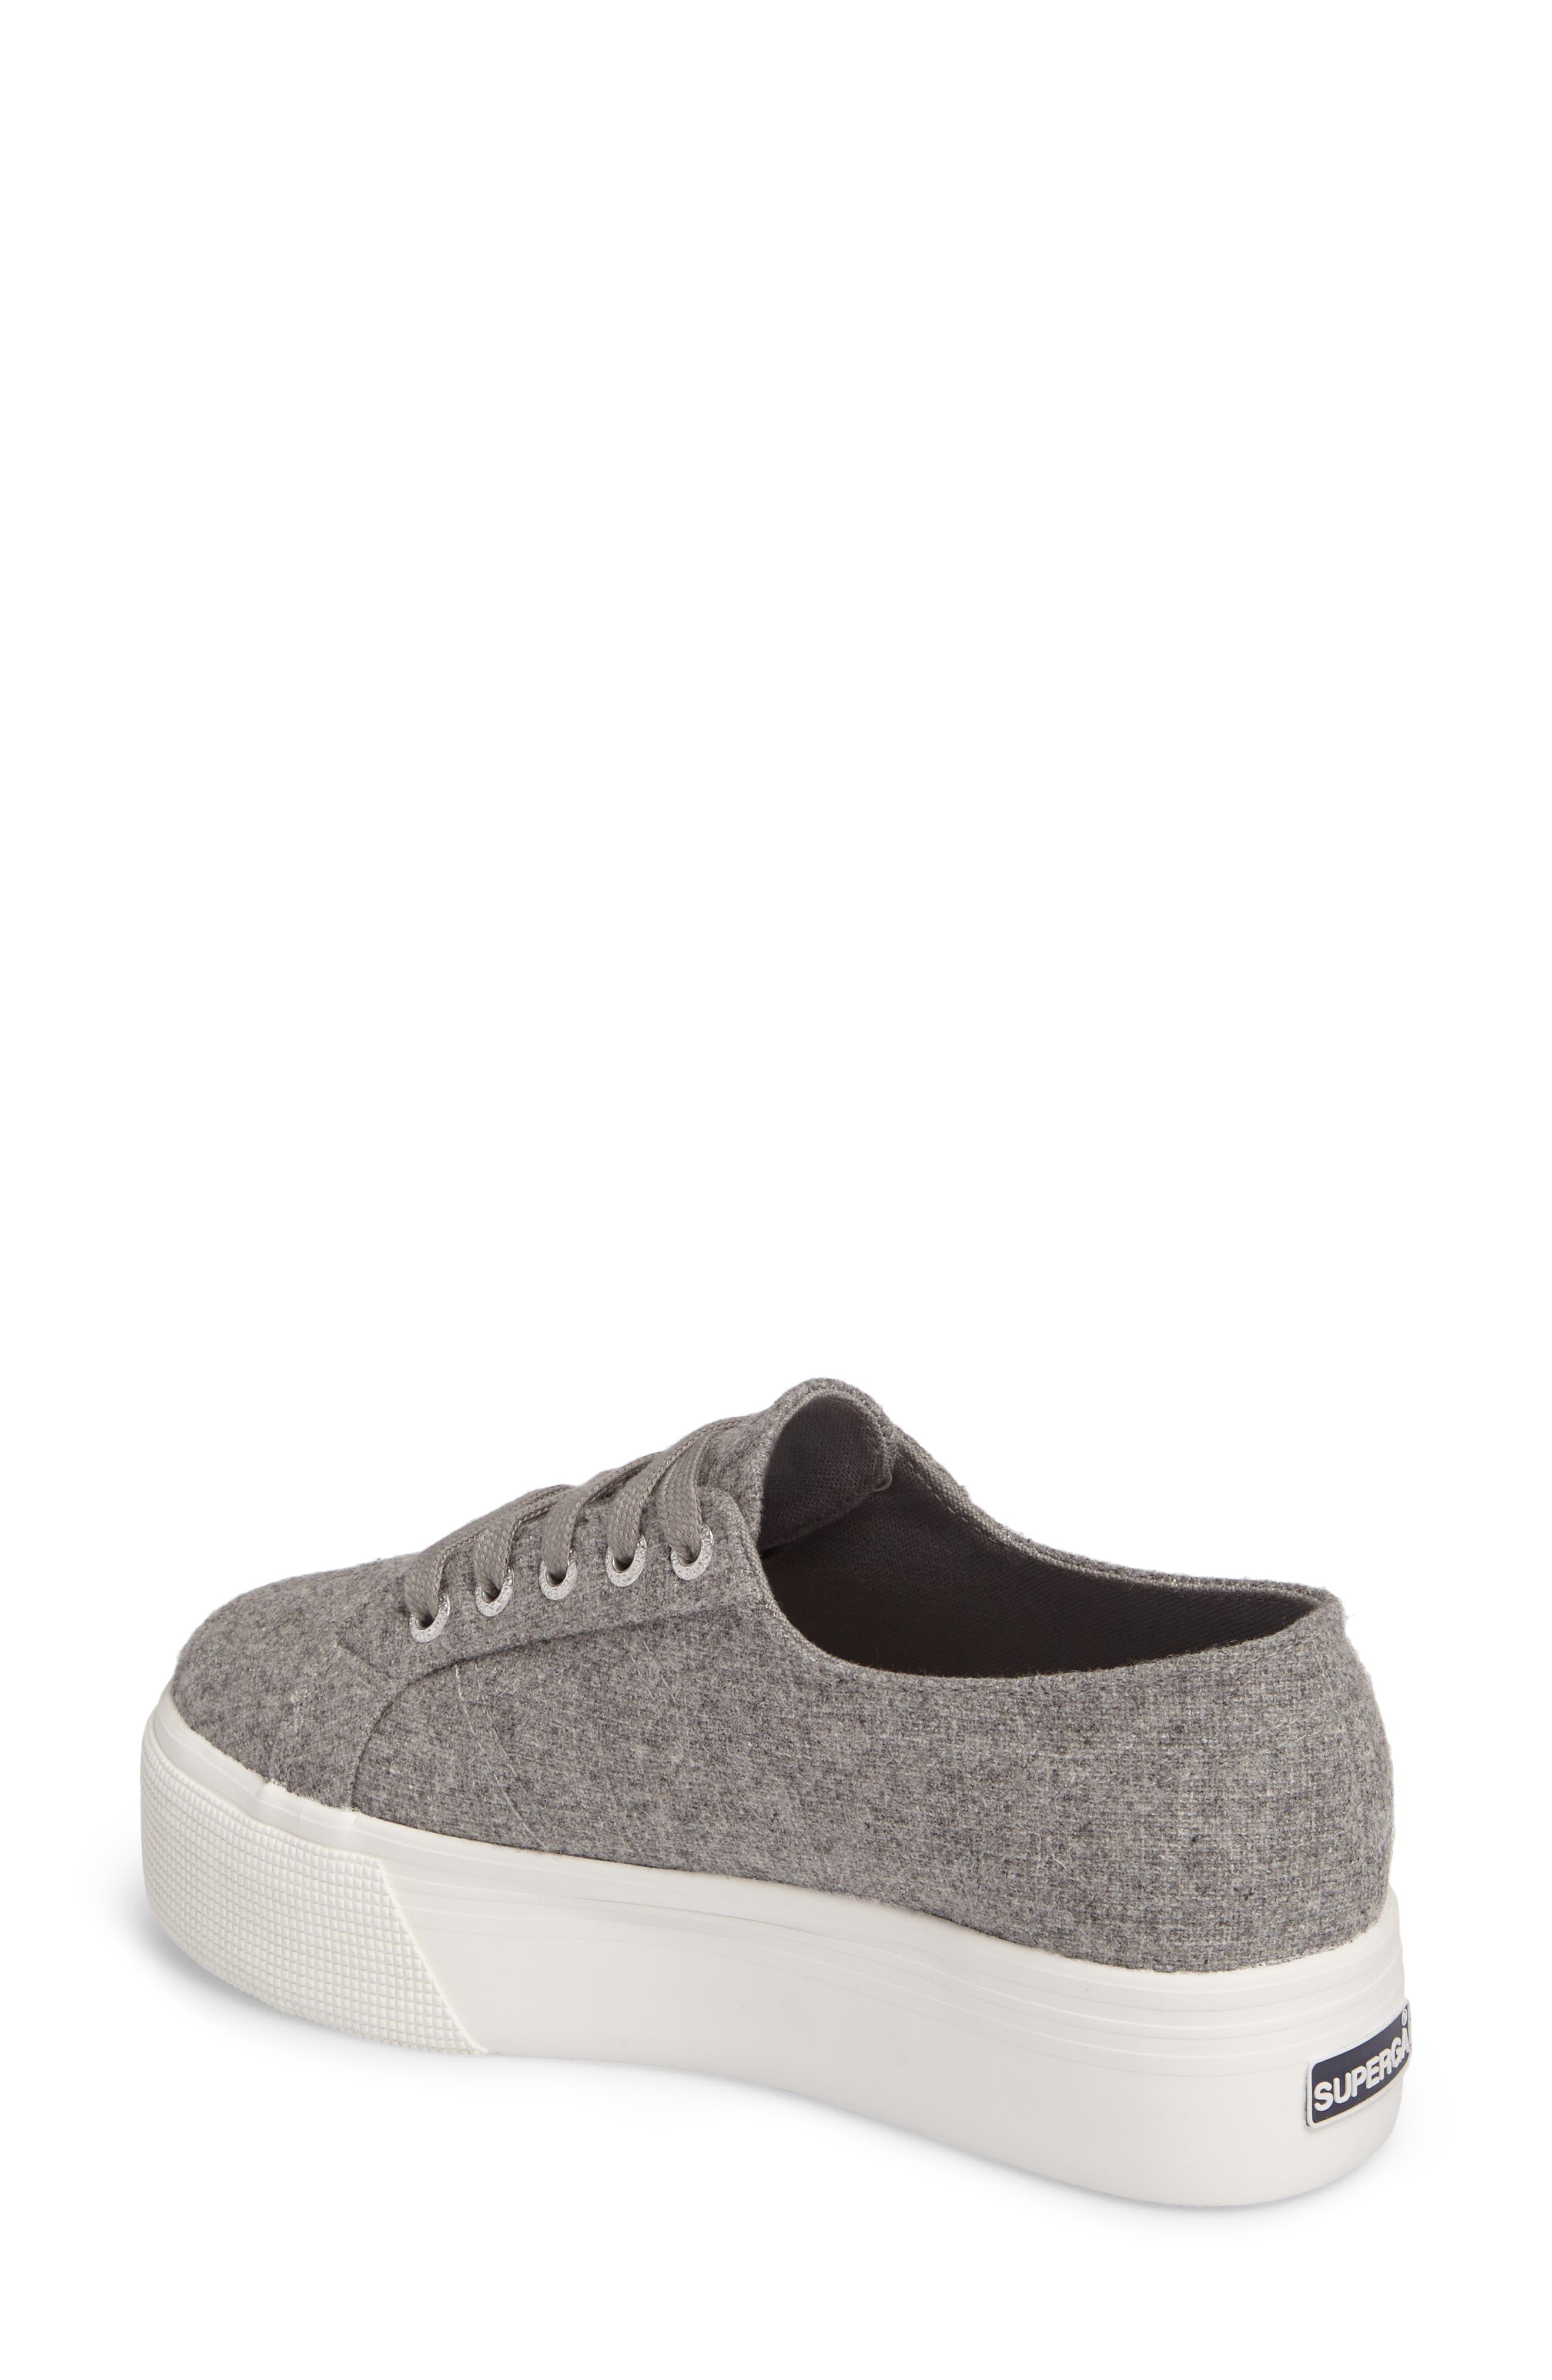 2790 Platform Sneaker,                             Alternate thumbnail 2, color,                             Light Grey Canvas